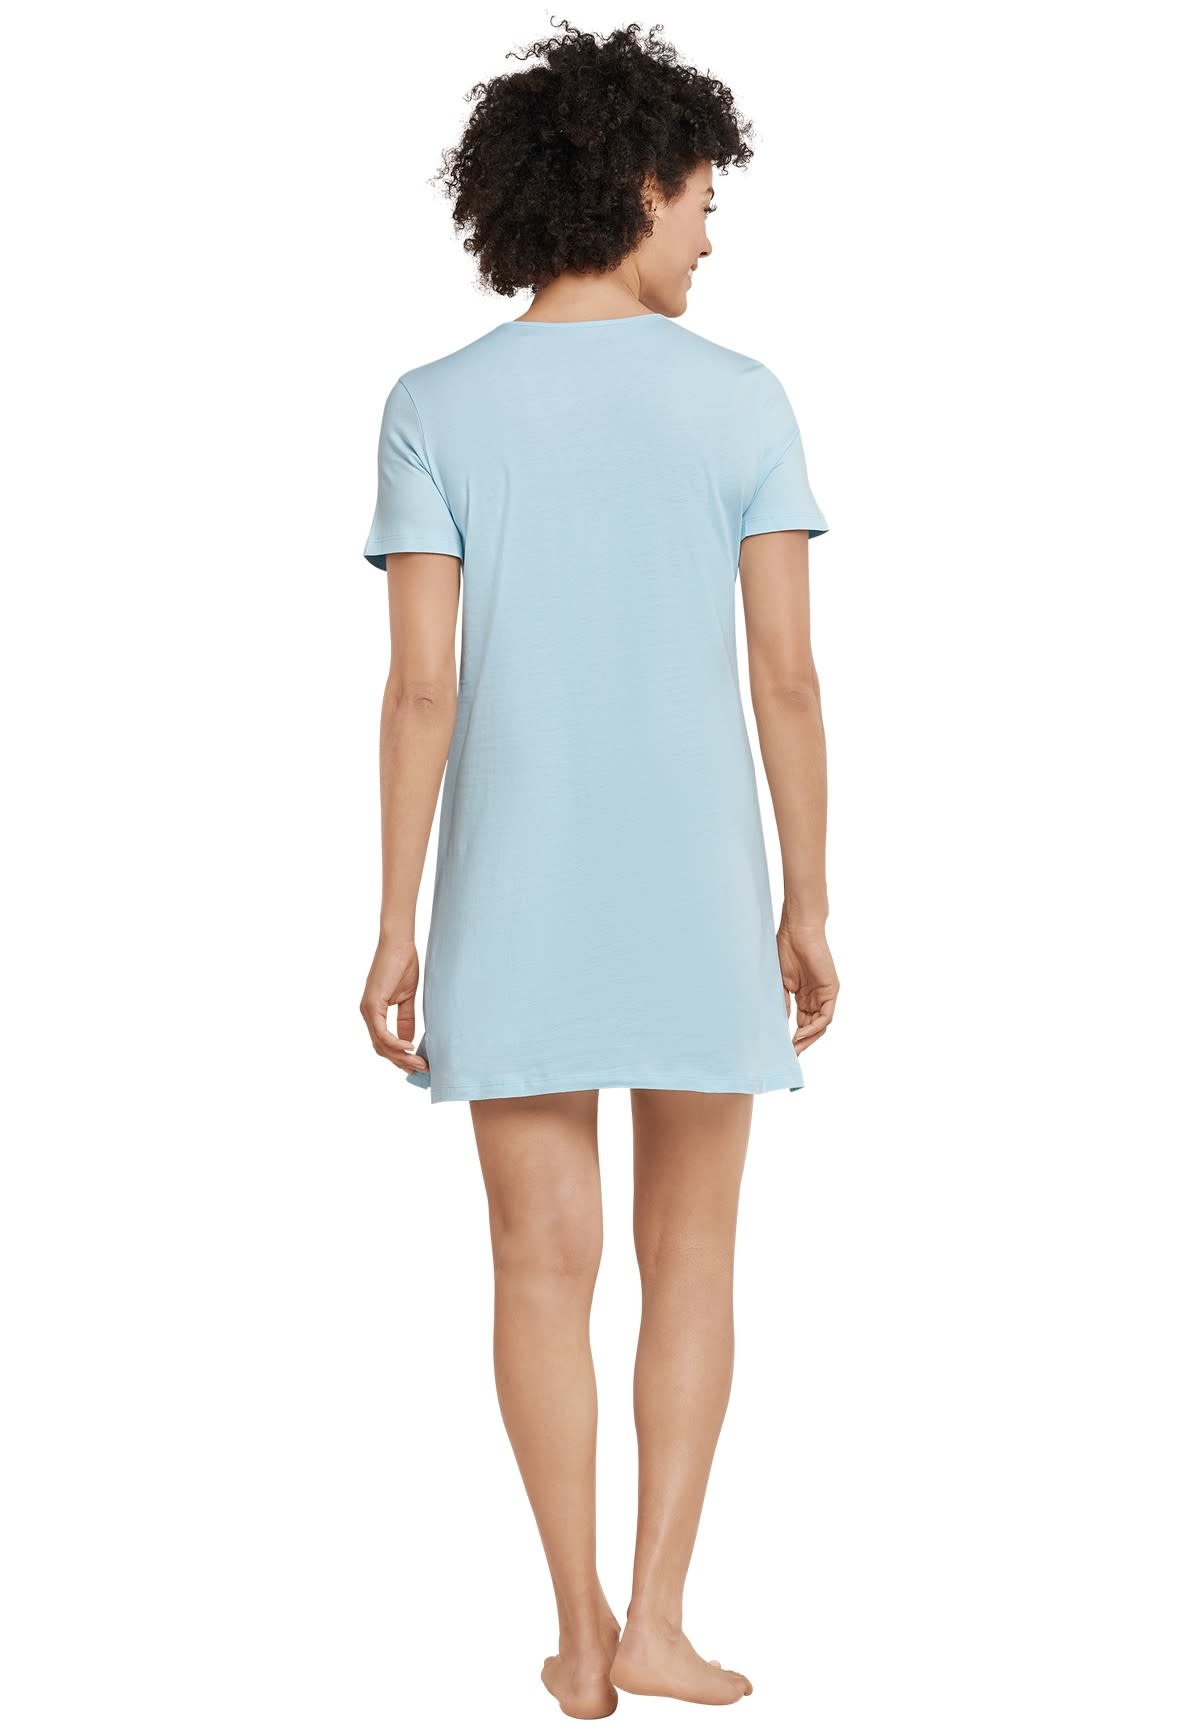 Nachthemd korte mouw 169488 - lichtblauw-6